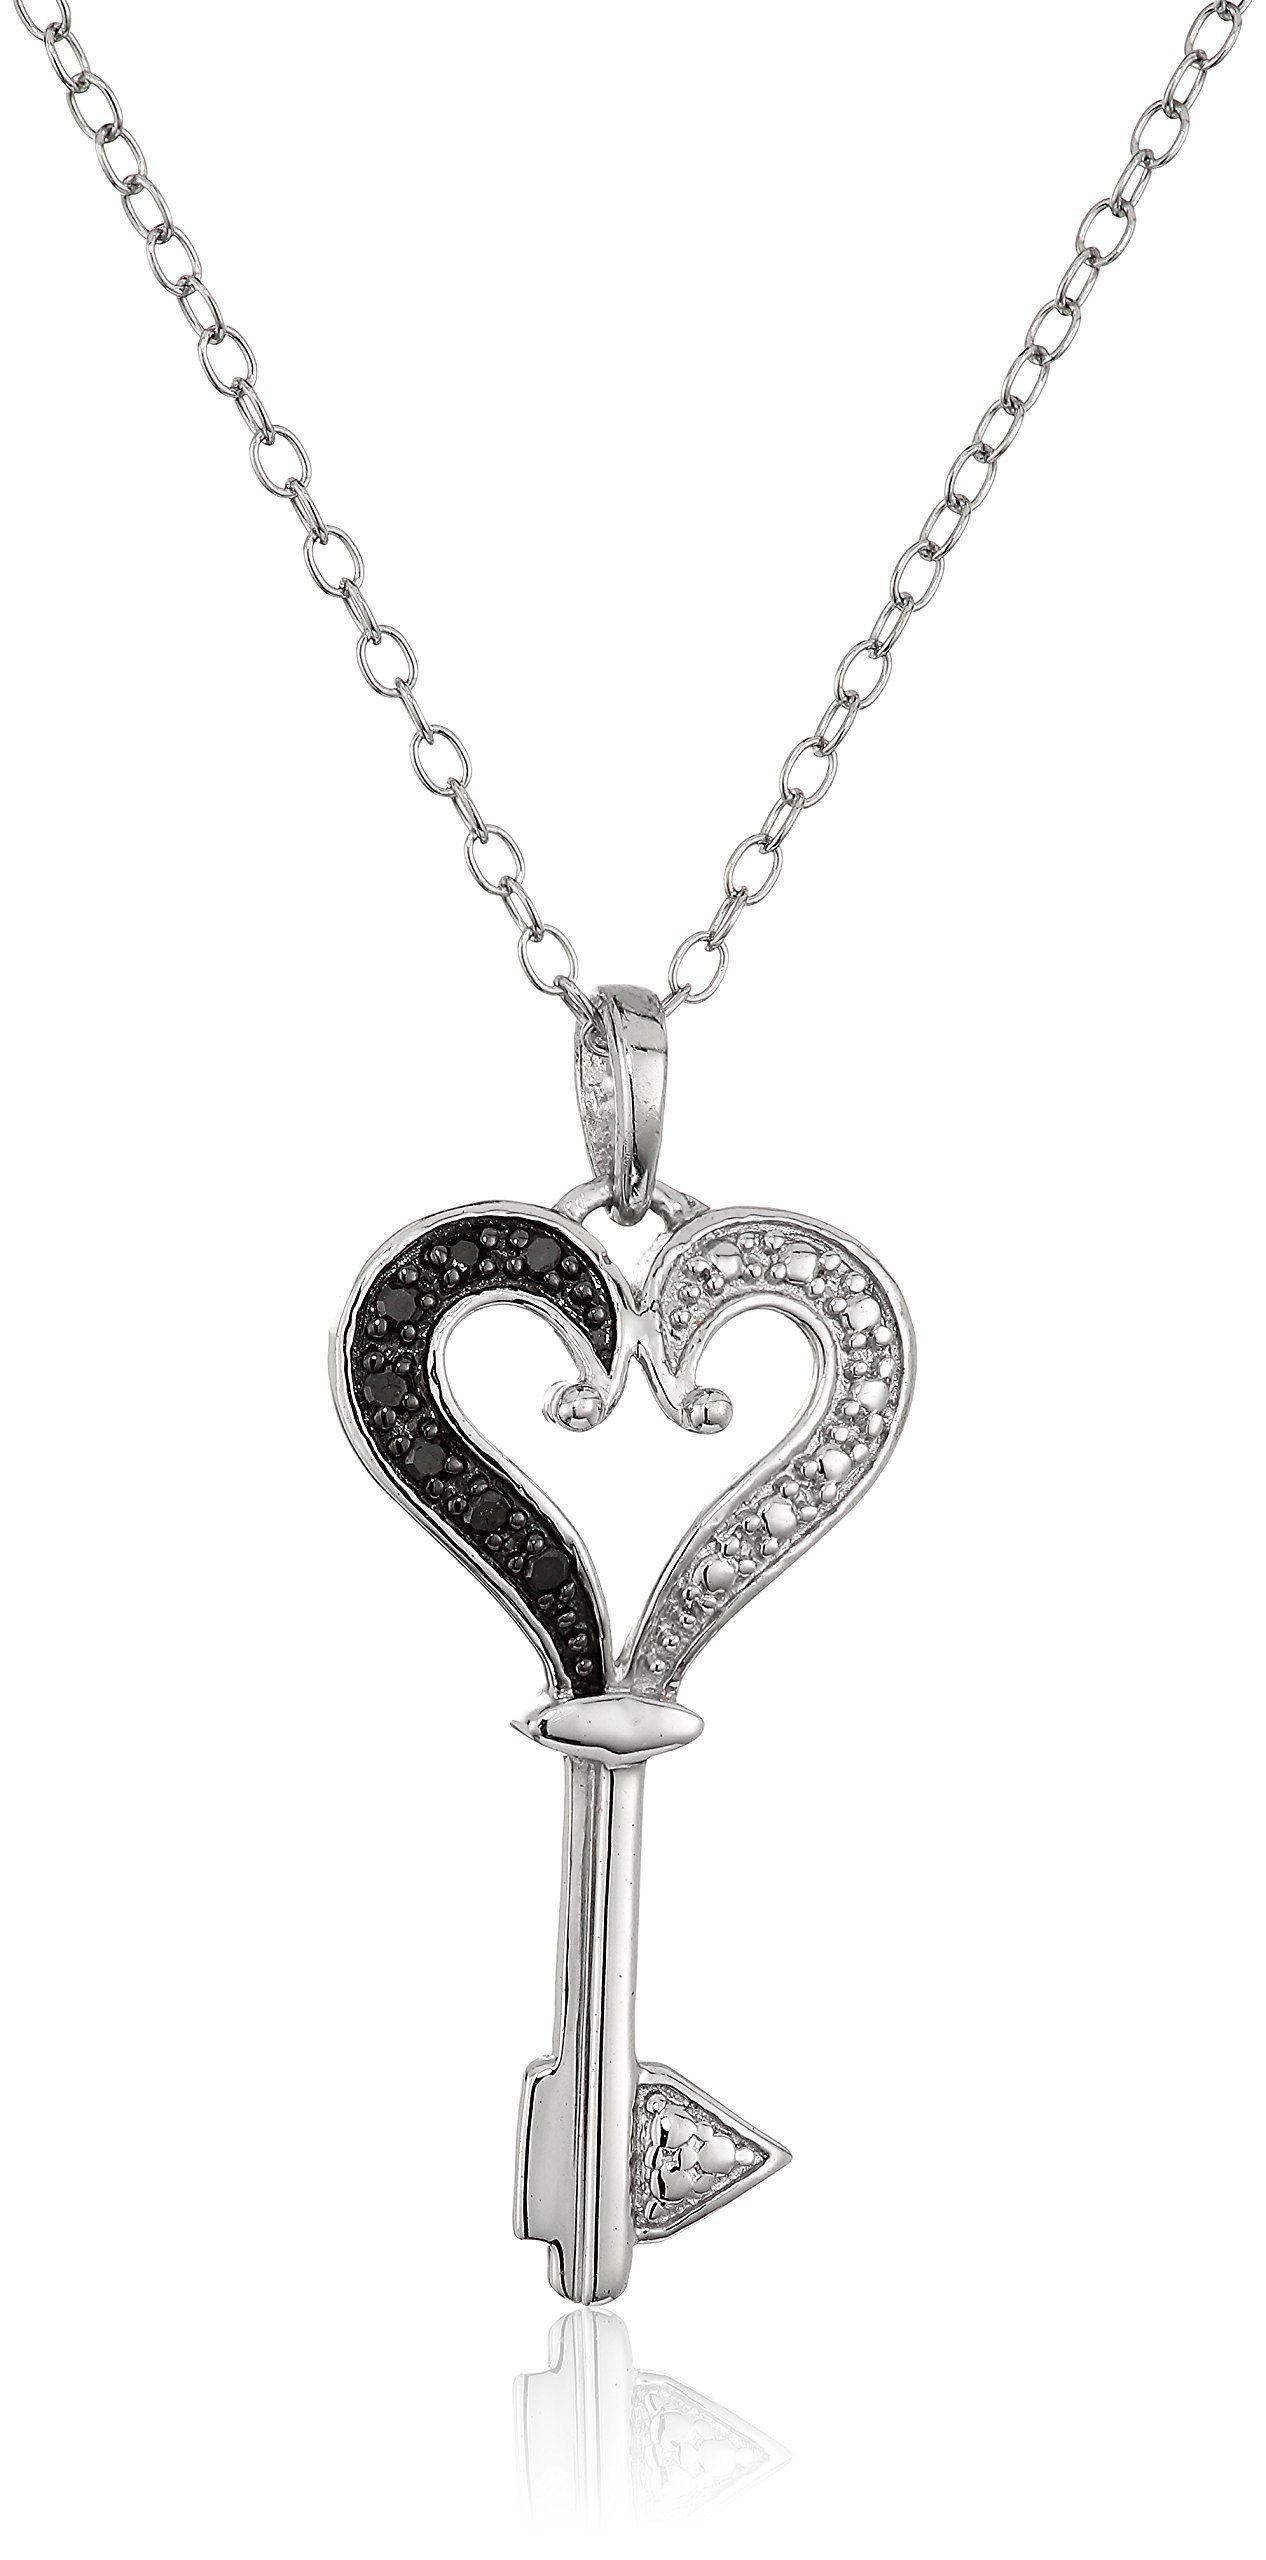 Sterling silver black diamond heart key pendant necklace 18 sterling silver black diamond heart key pendant necklace 18 heart warming key pendant mozeypictures Images